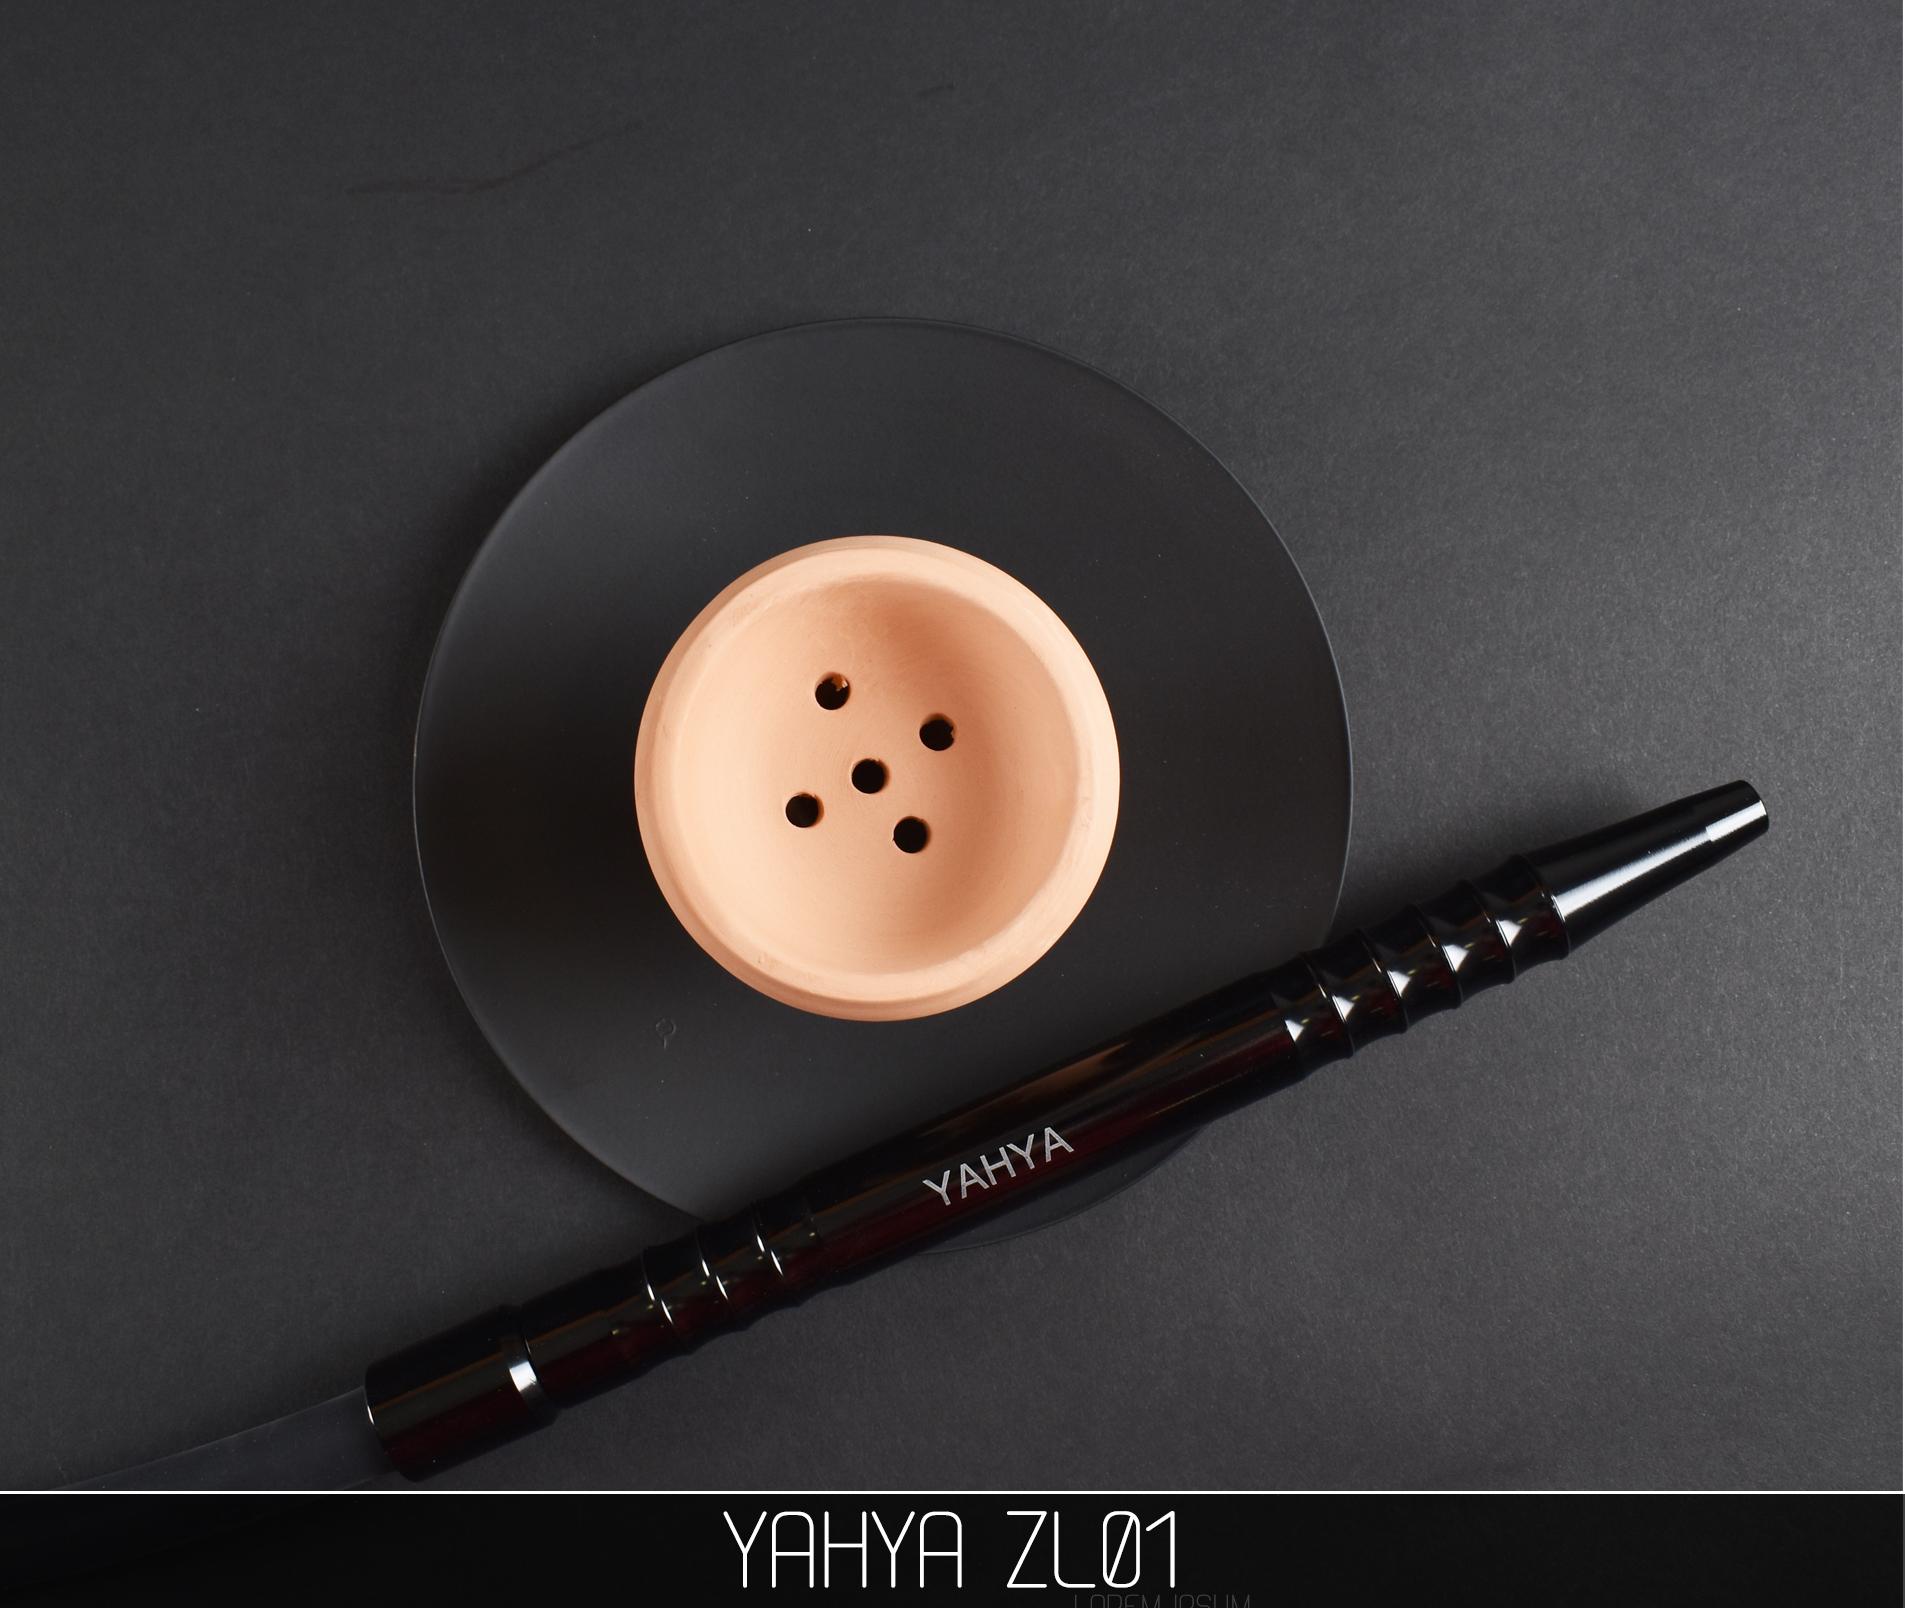 Кальян Yahya ZL01 BLACK - фото 6 - Kalyanchik.ua